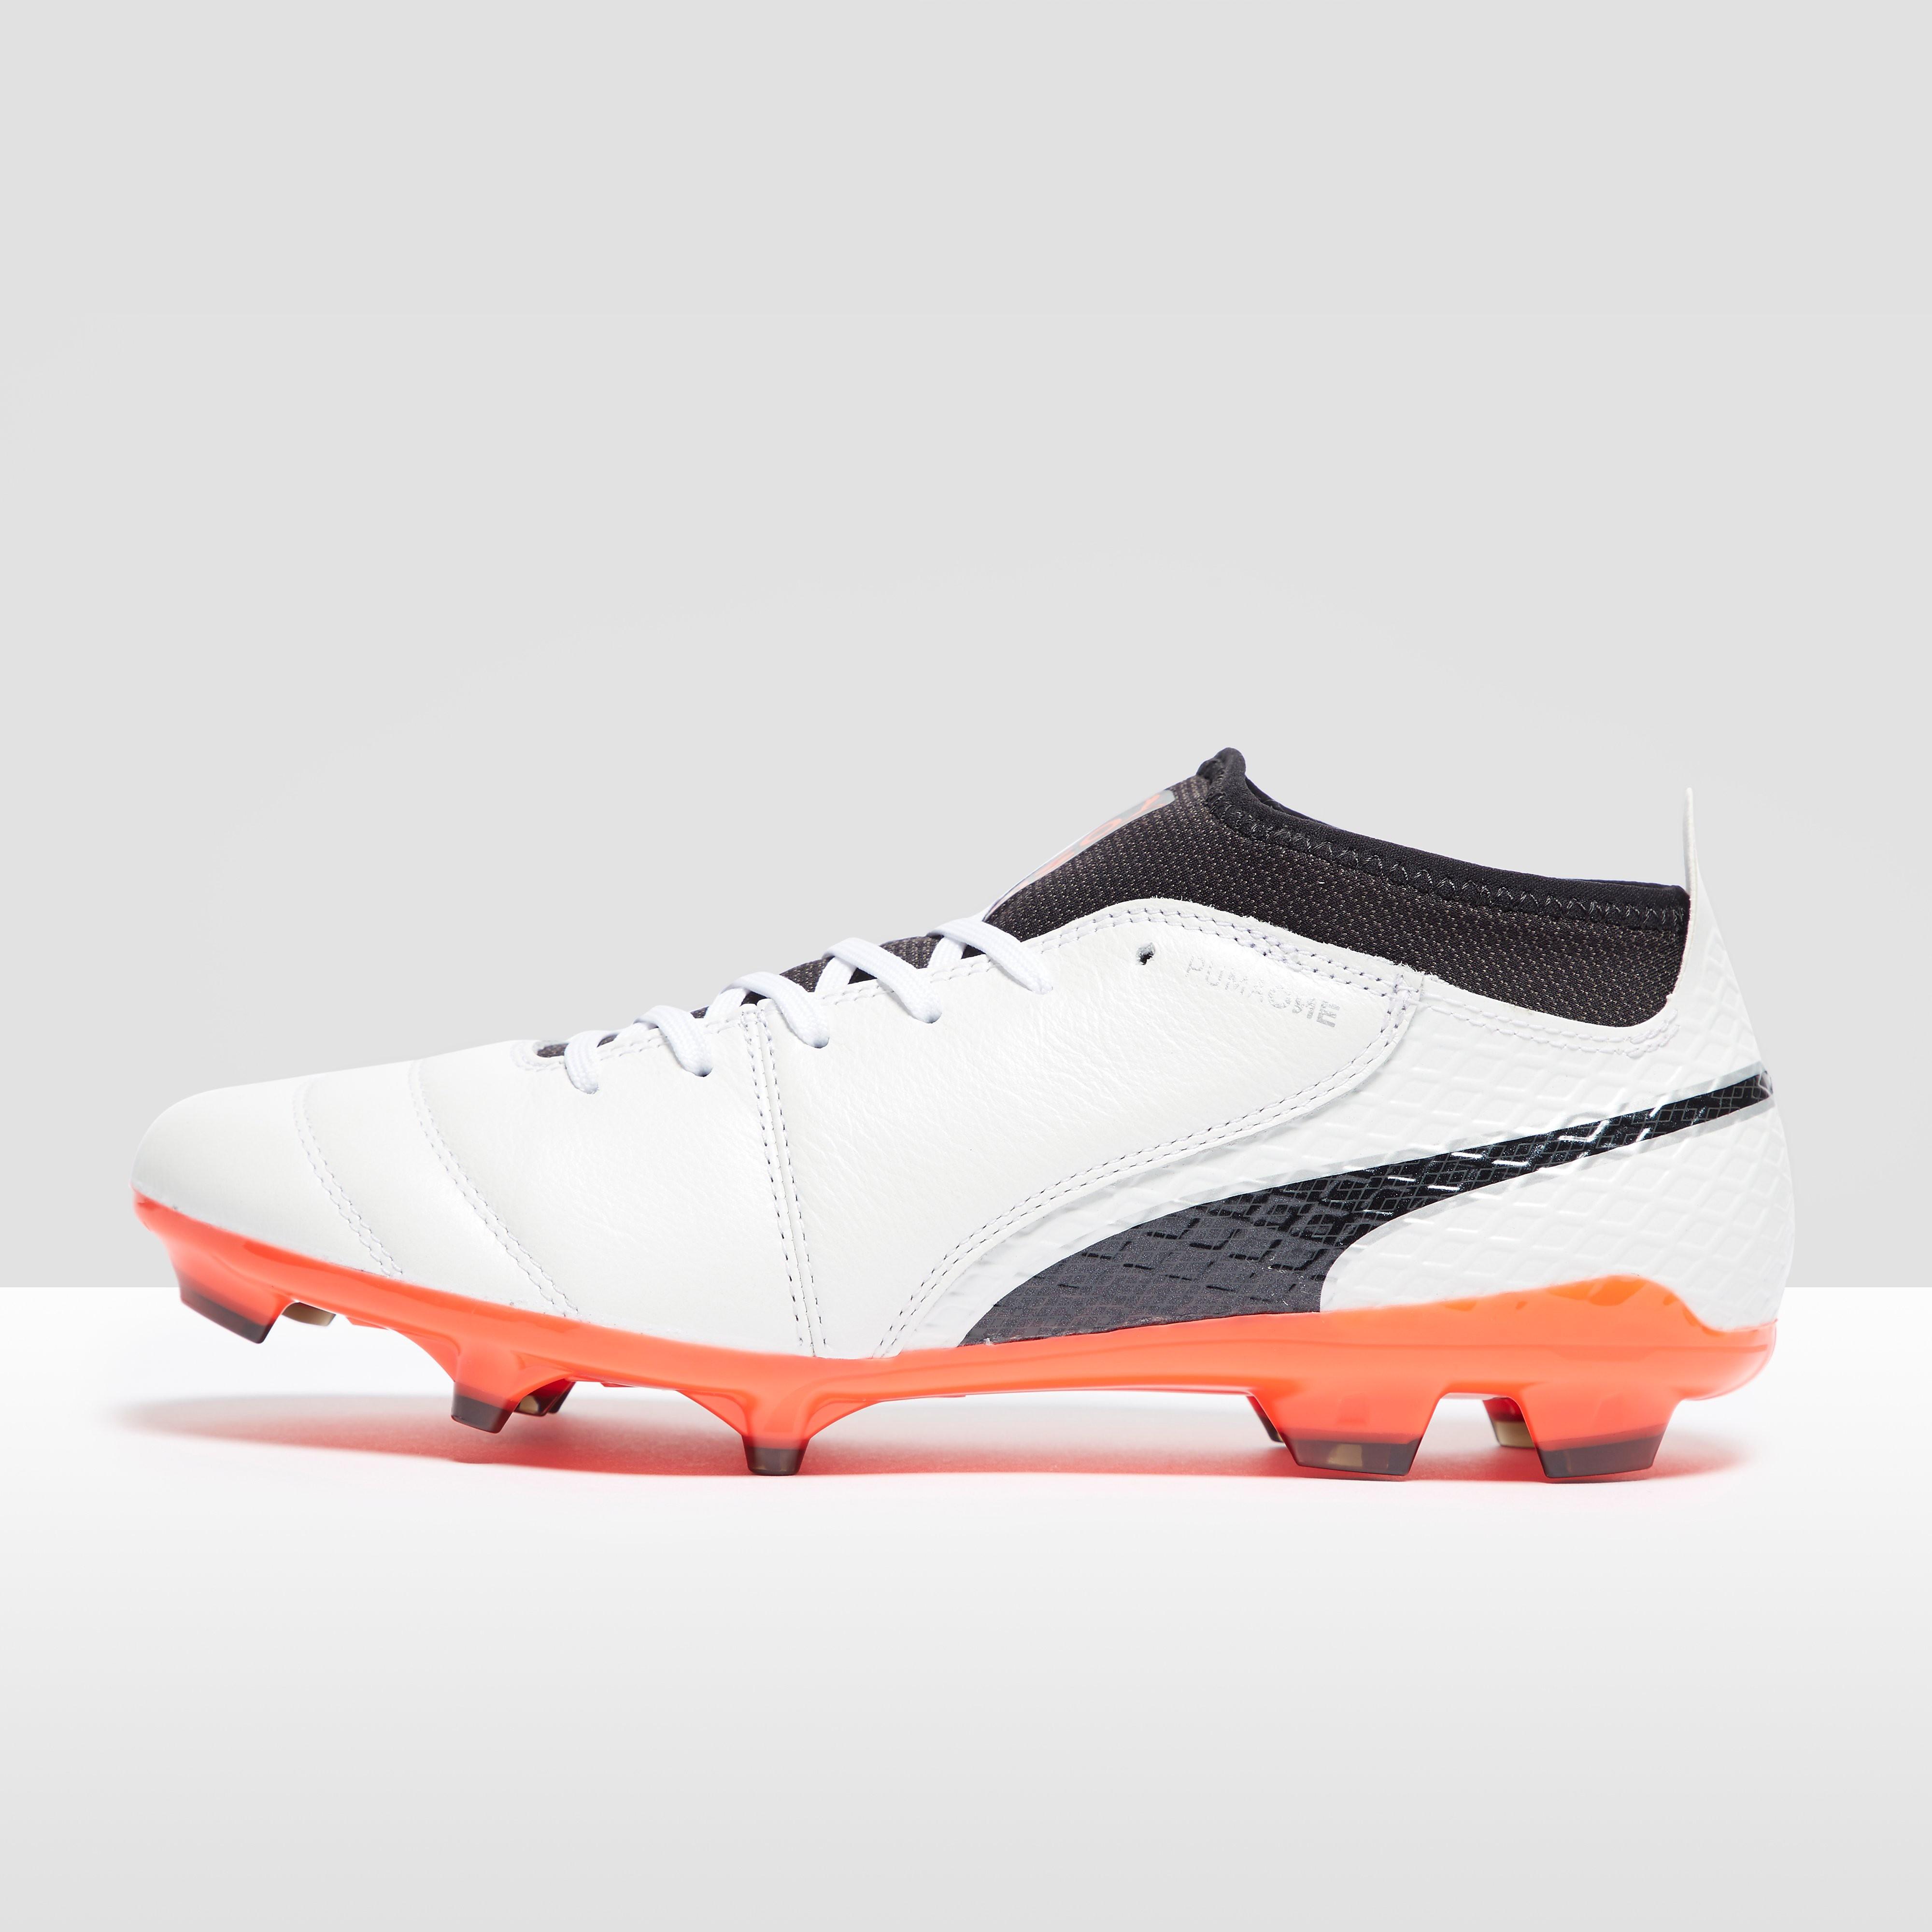 PUMA One 17.2 FG Men's Football Boots